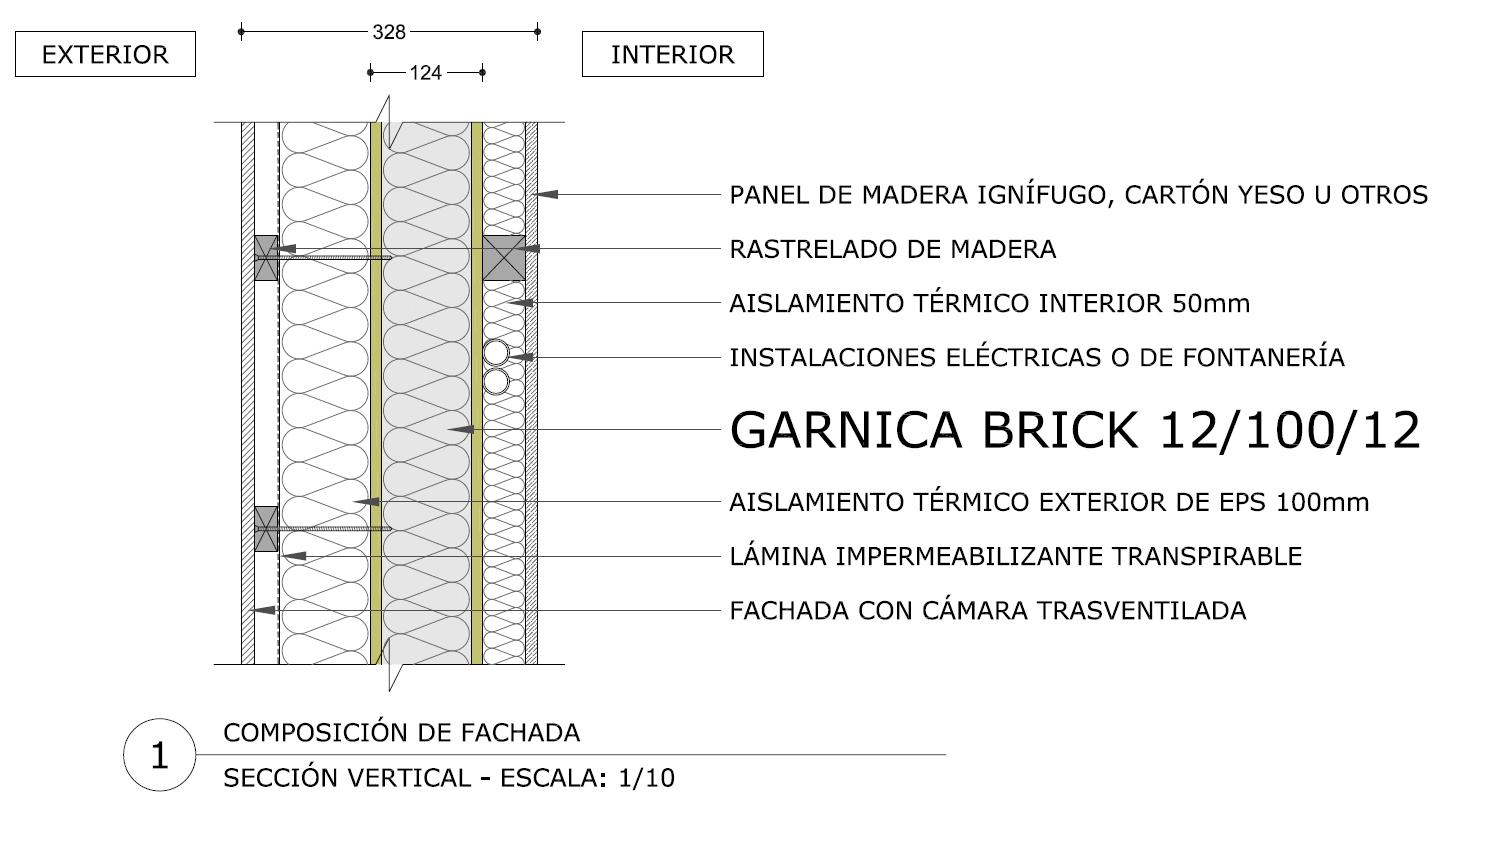 G brick paneles estructurales aislantes garnica for Panel aislante termico